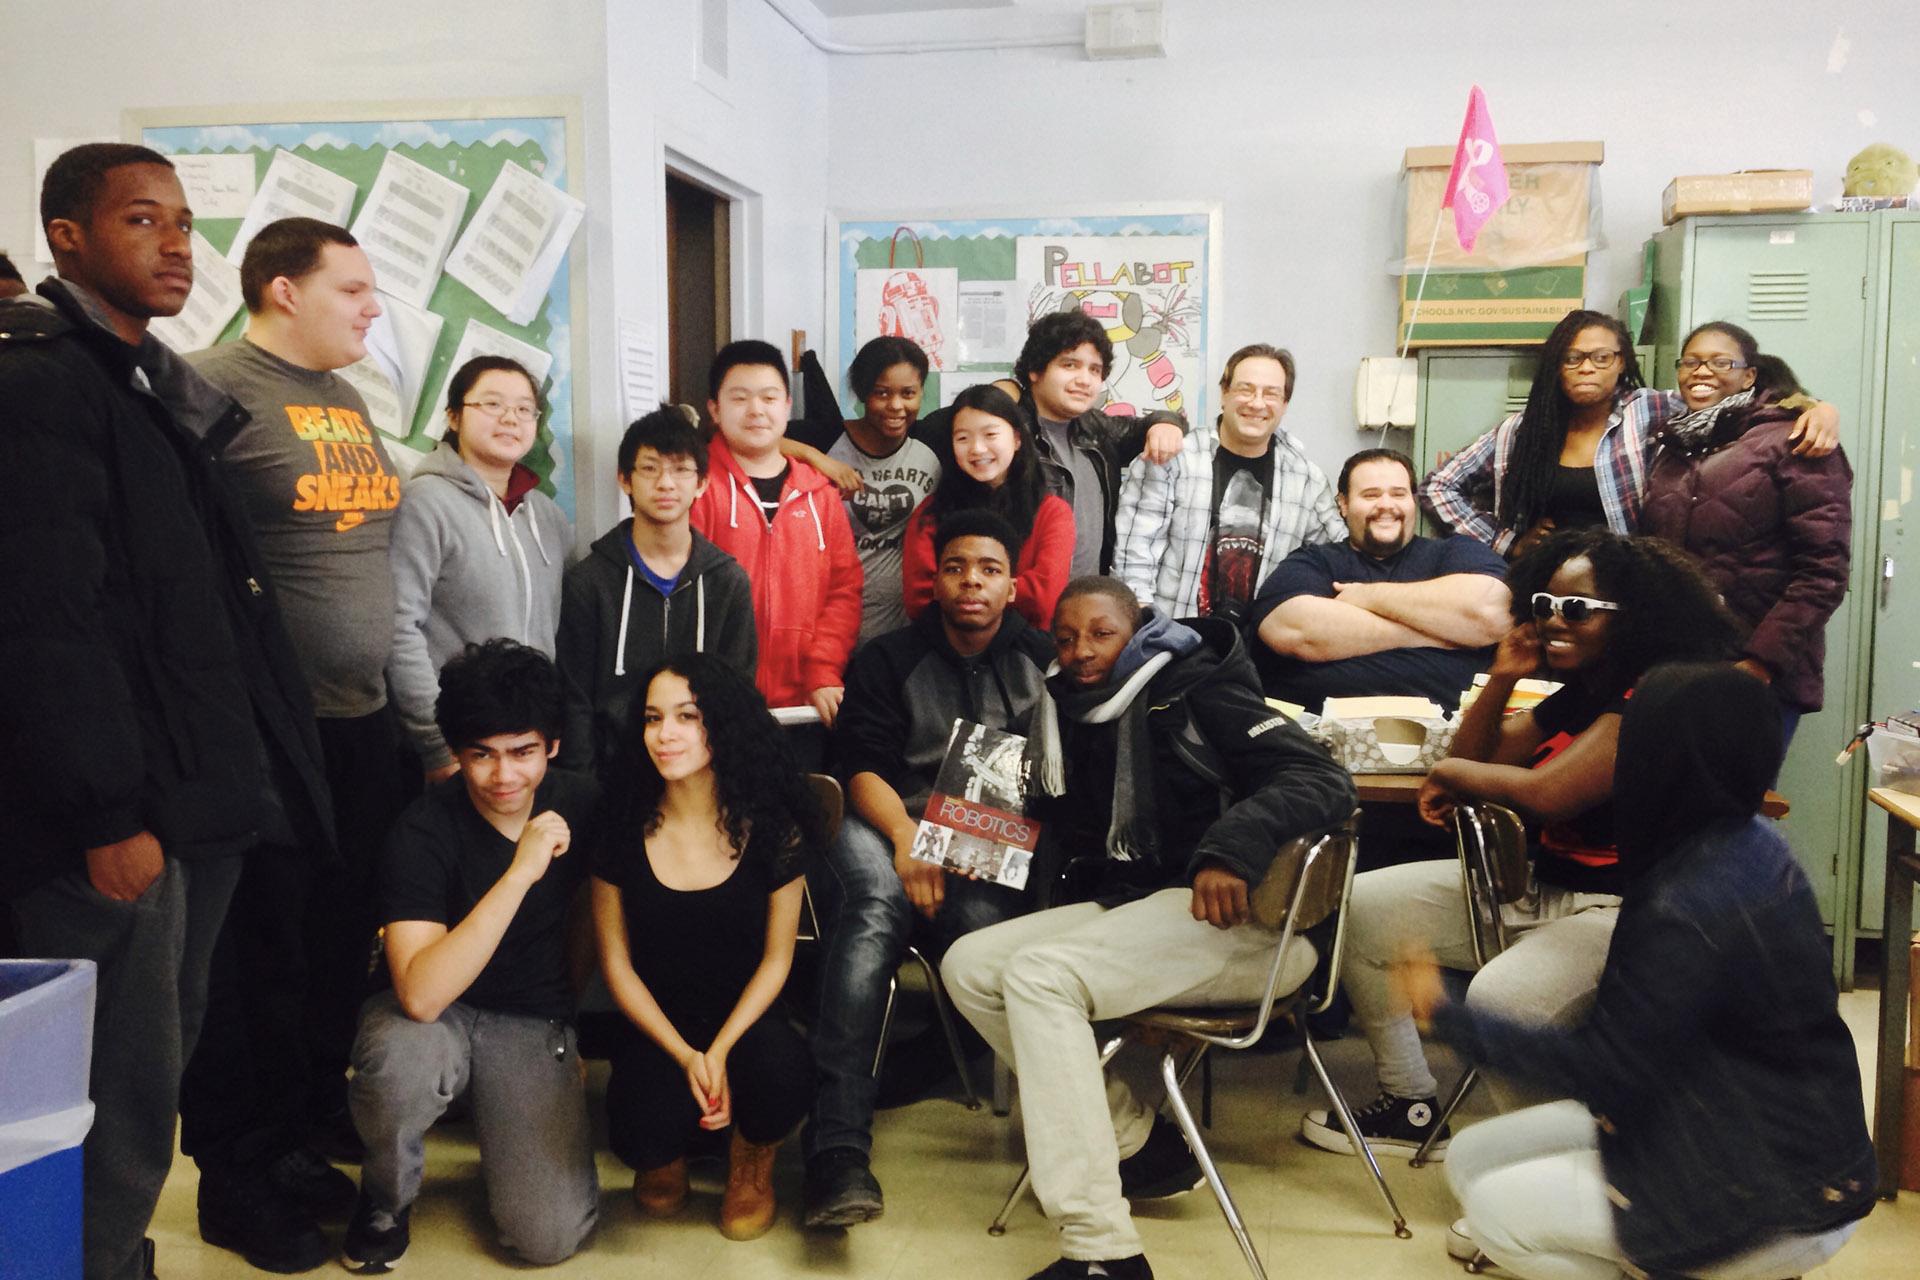 John Dewey High School Underwater Robotics Club meeting, 2015. Coaches Filippo Dispenza and Lane Rosen